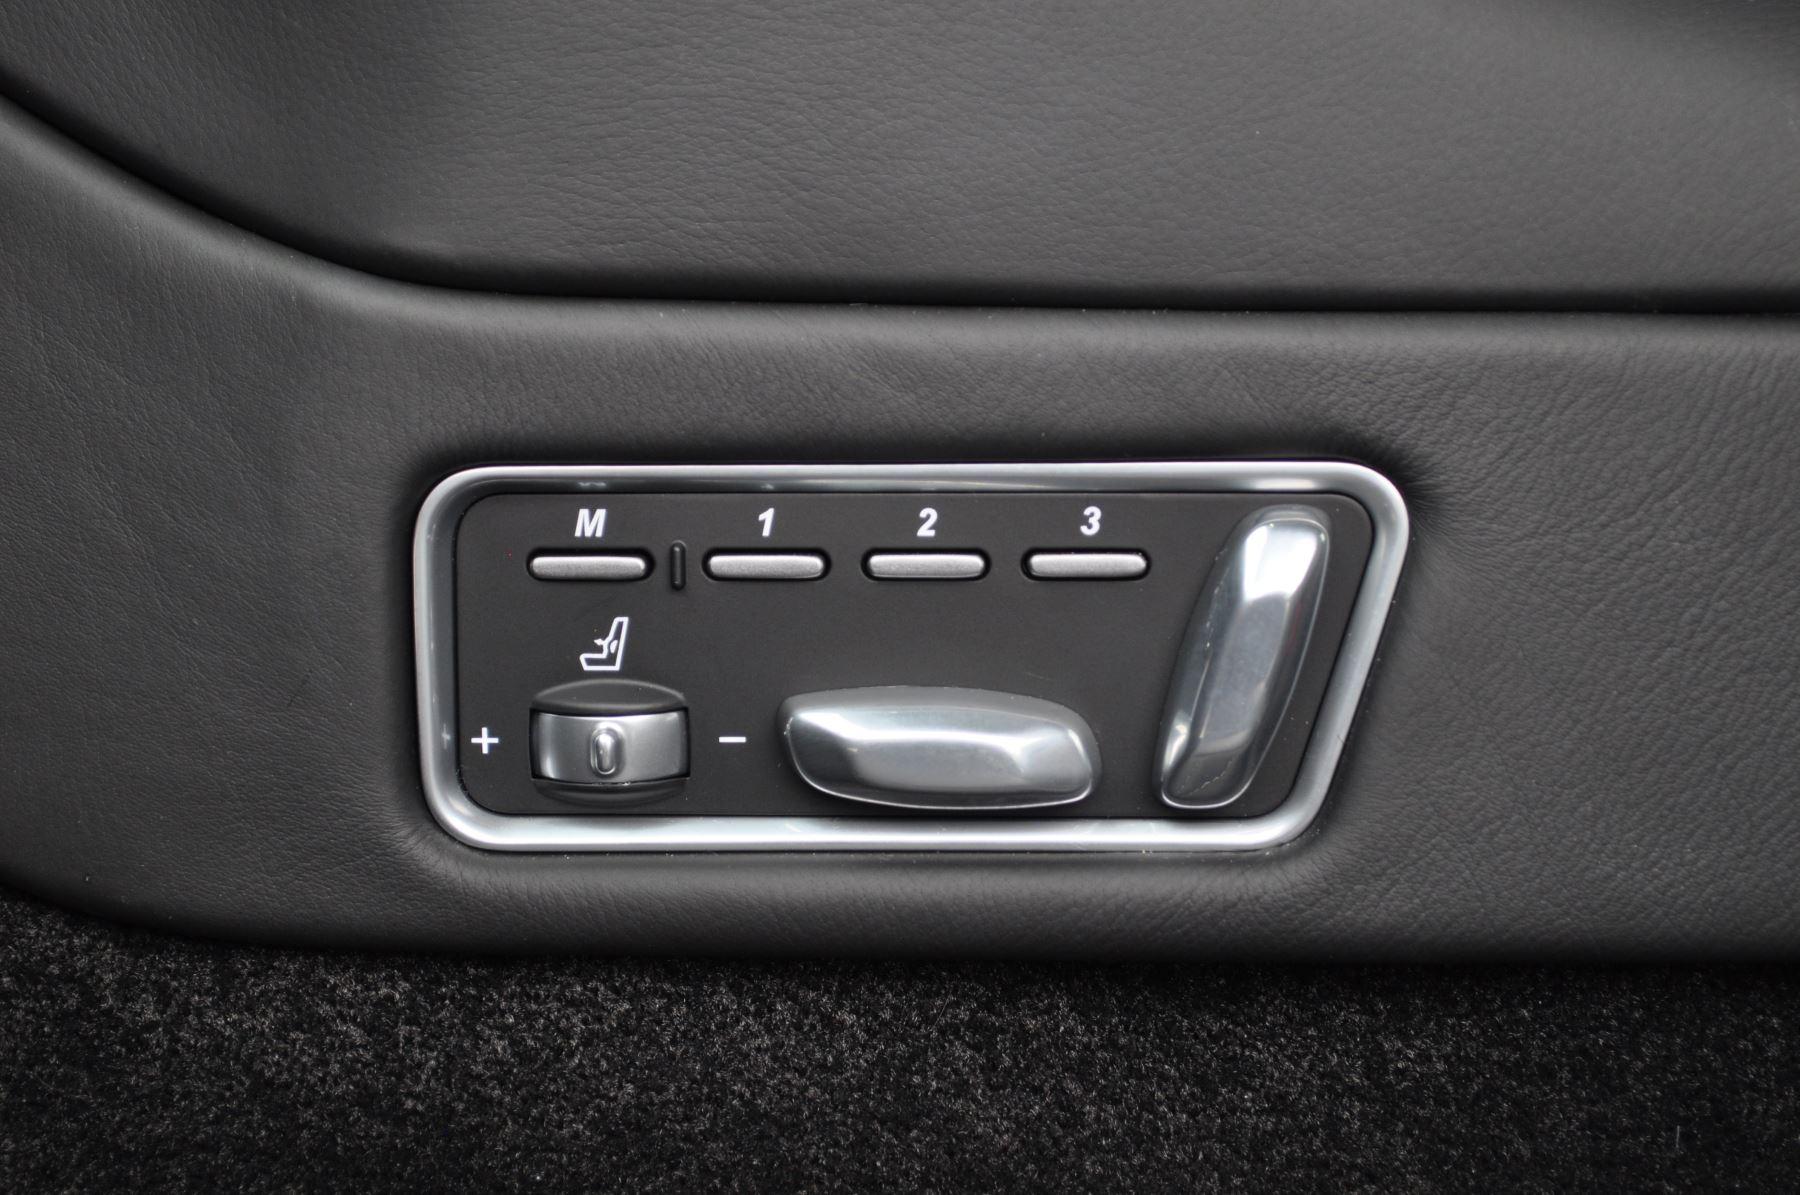 Aston Martin Vanquish S V12 [595] S 2+2 2dr Touchtronic image 38